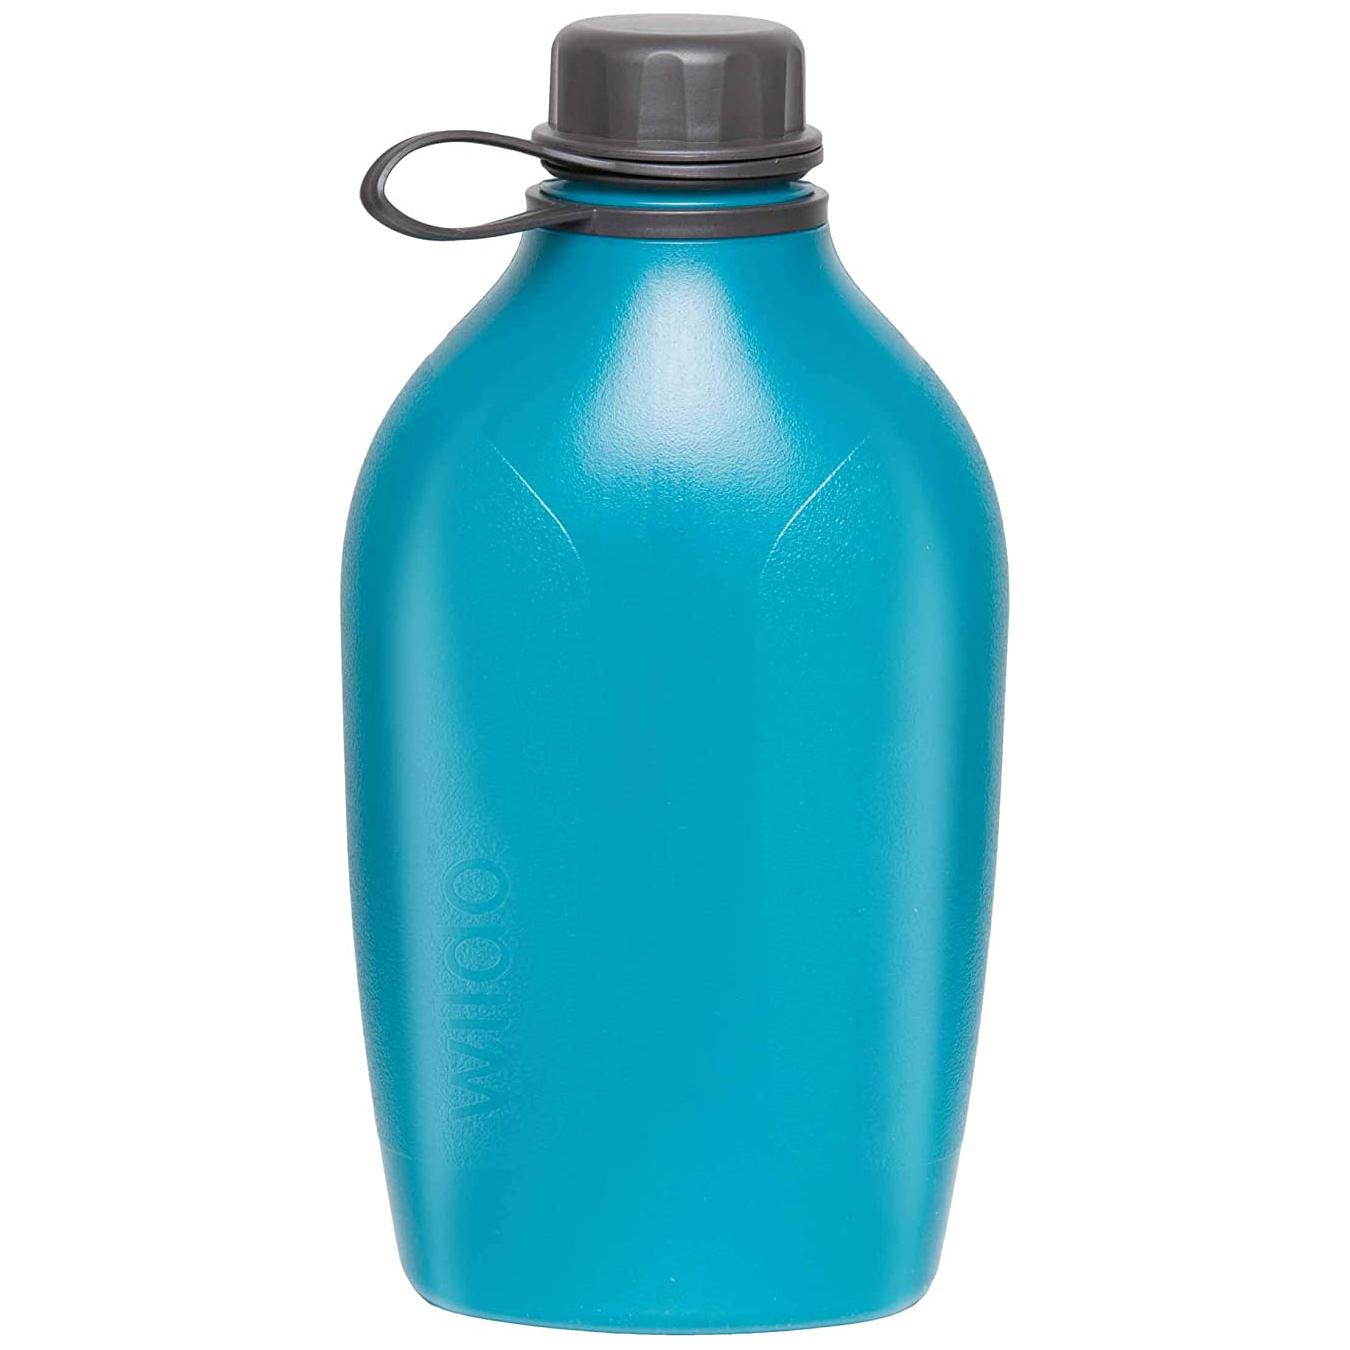 Wildo Explorer Bottle Green 1L - Trinkflasche - Azure